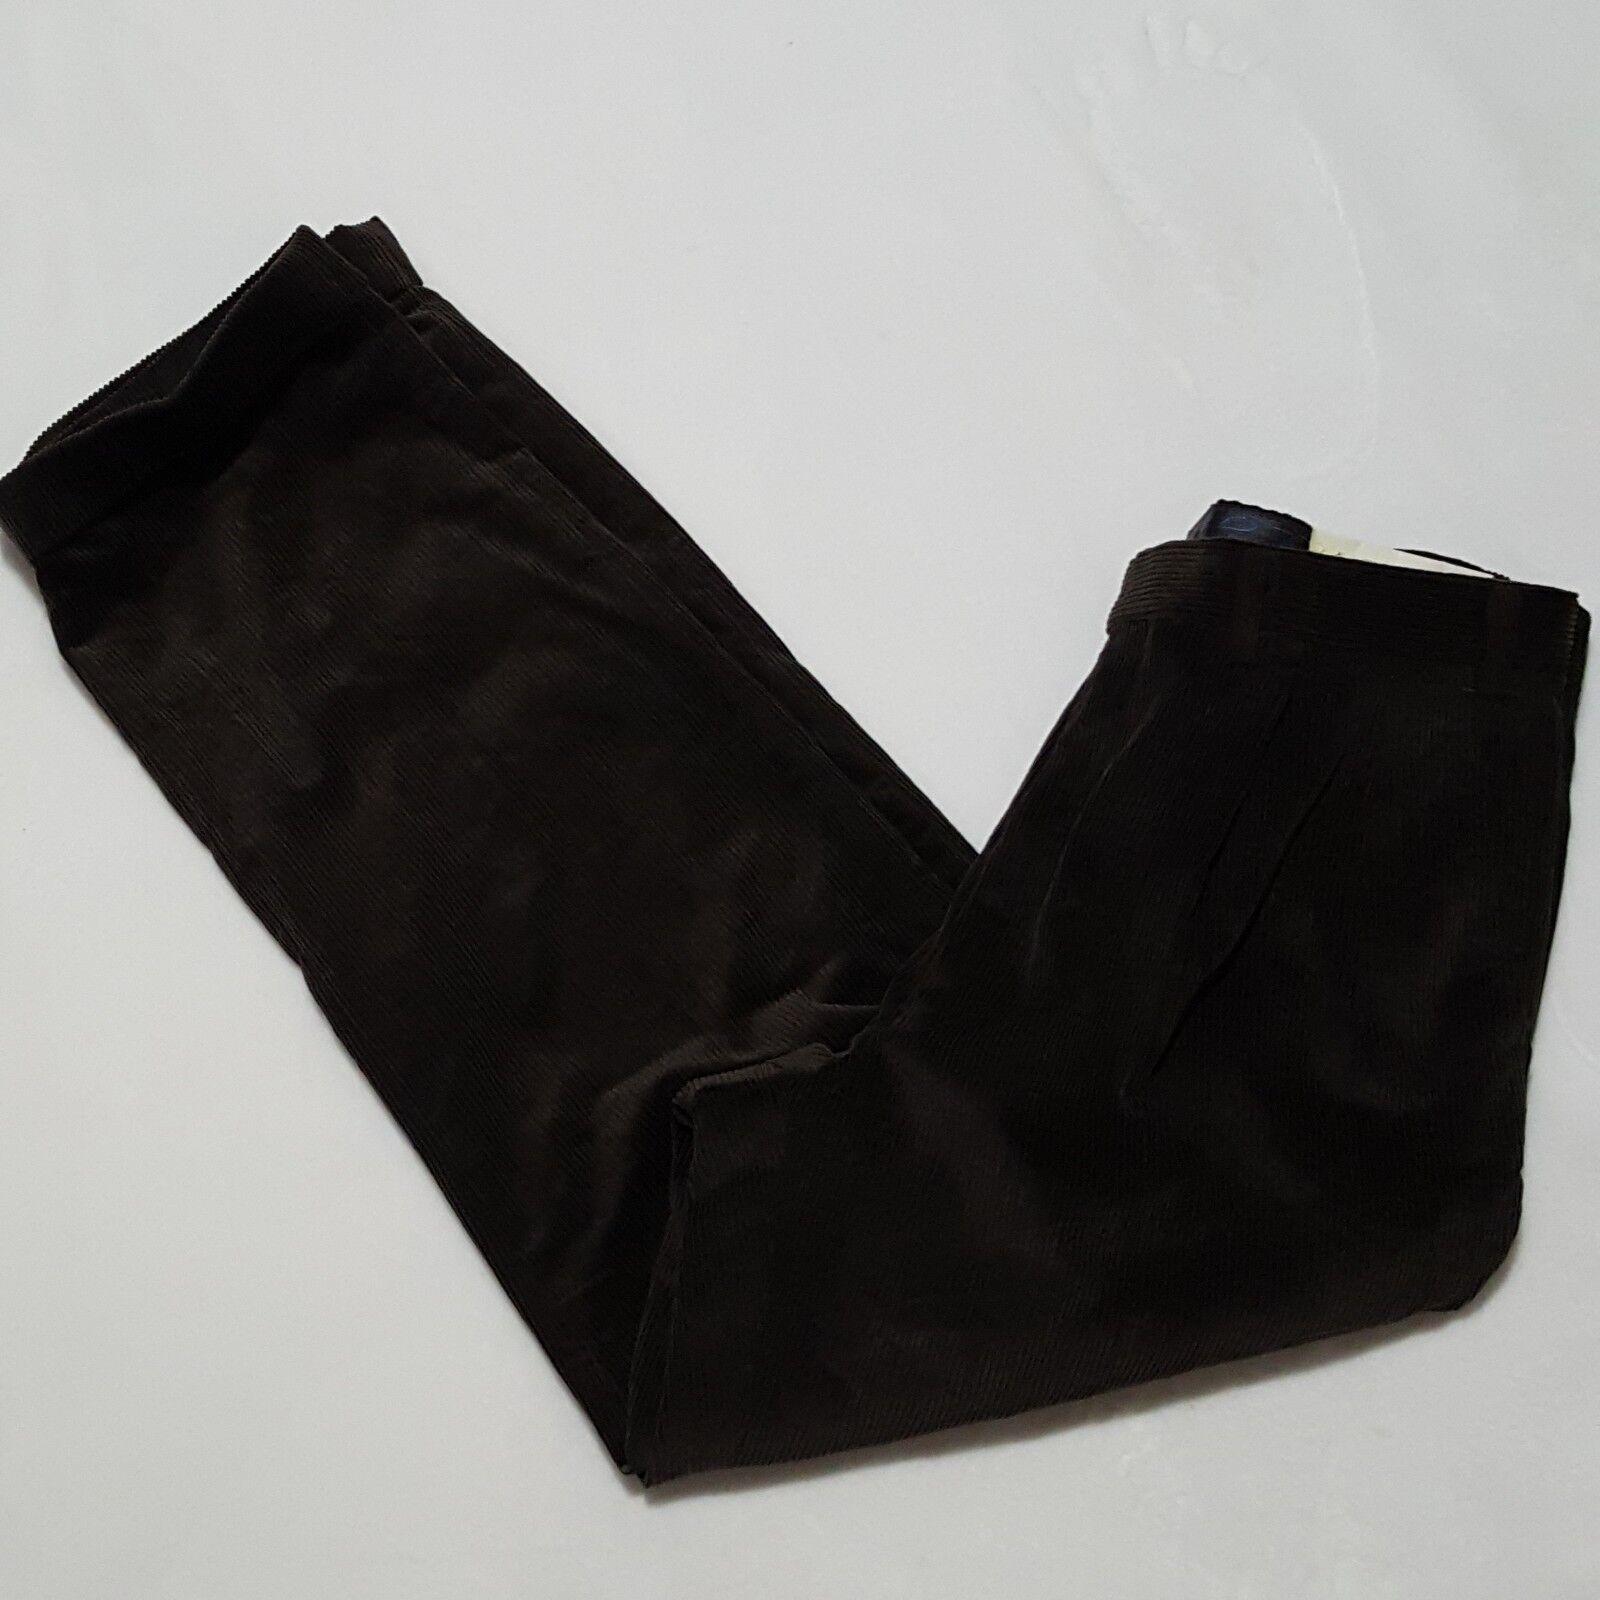 NEW Lauren Ralph Lauren 36x31 Pants Mens Corduroy Pleated Front Classic Fit Cuff